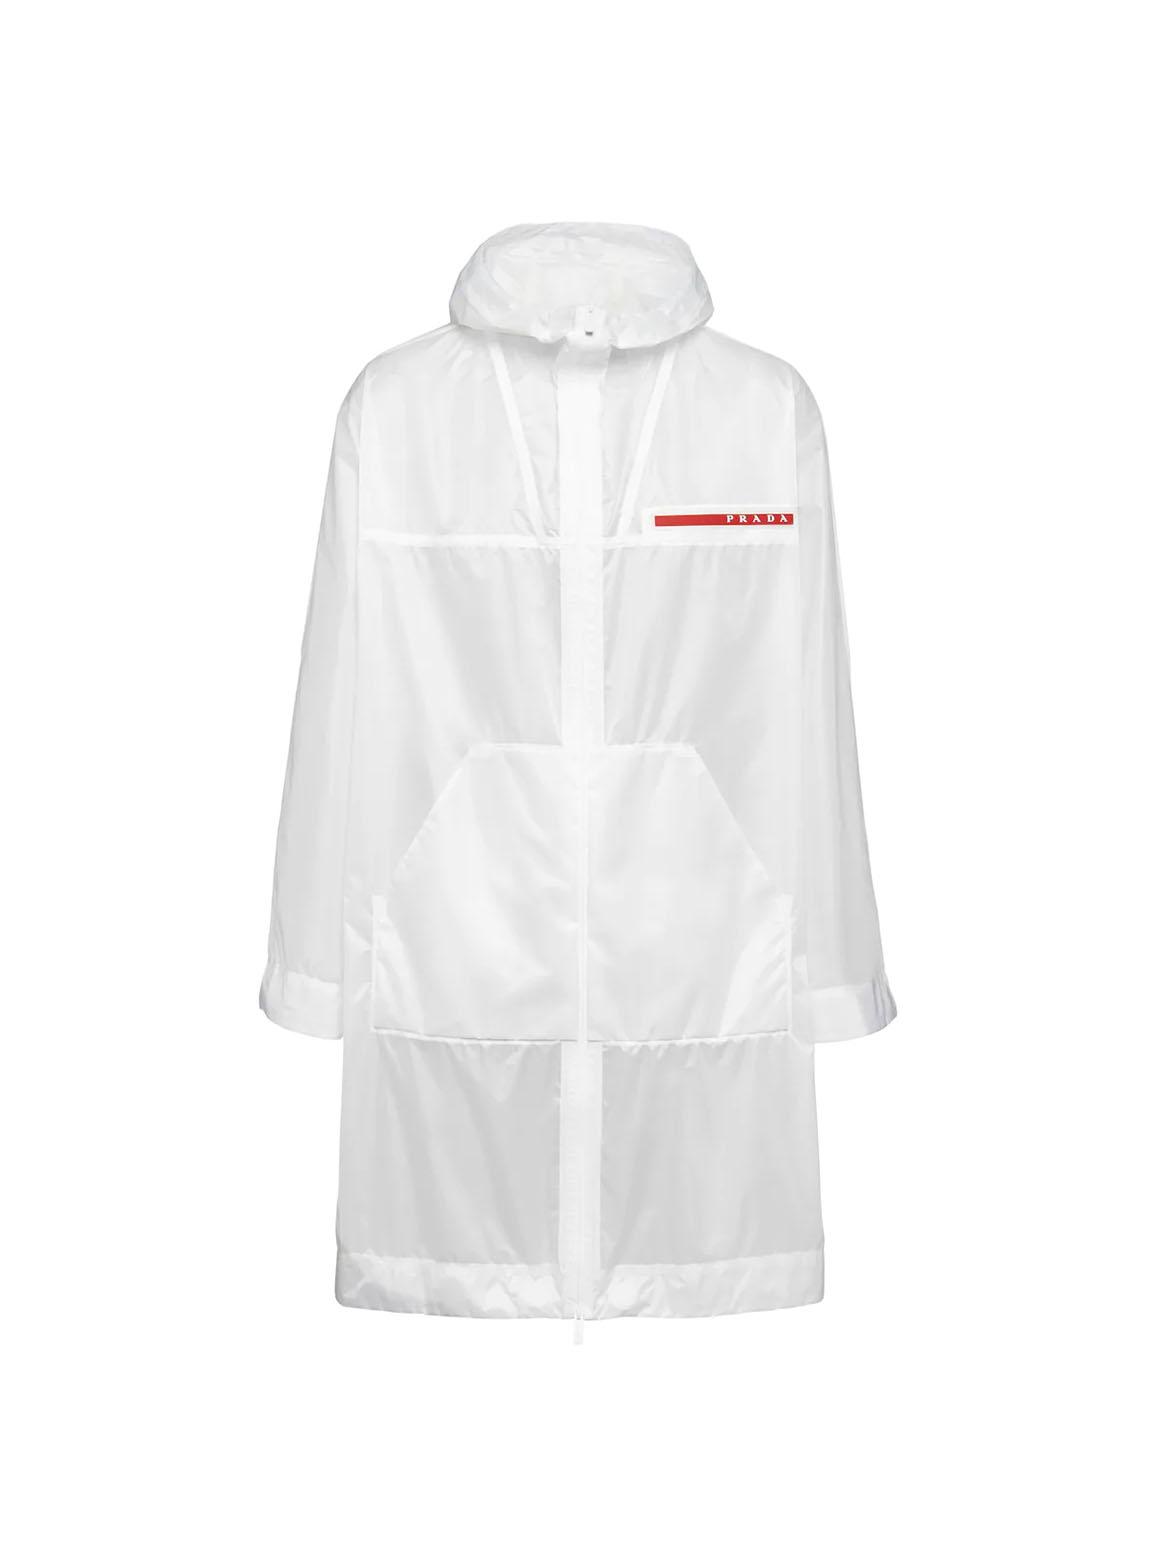 Ripstop hooded raincoat